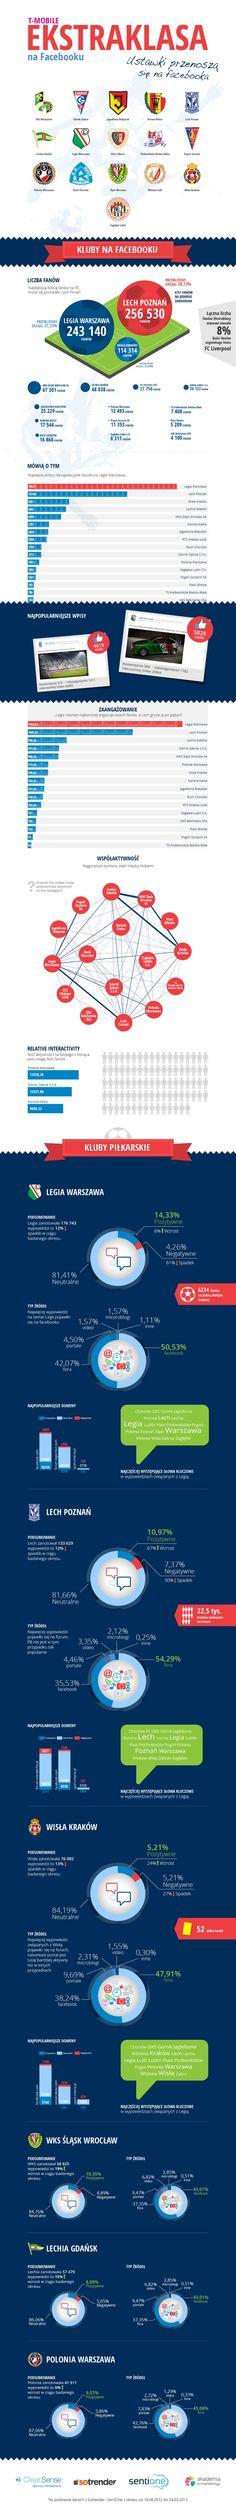 piłkarska #ekstraklasa w #sm